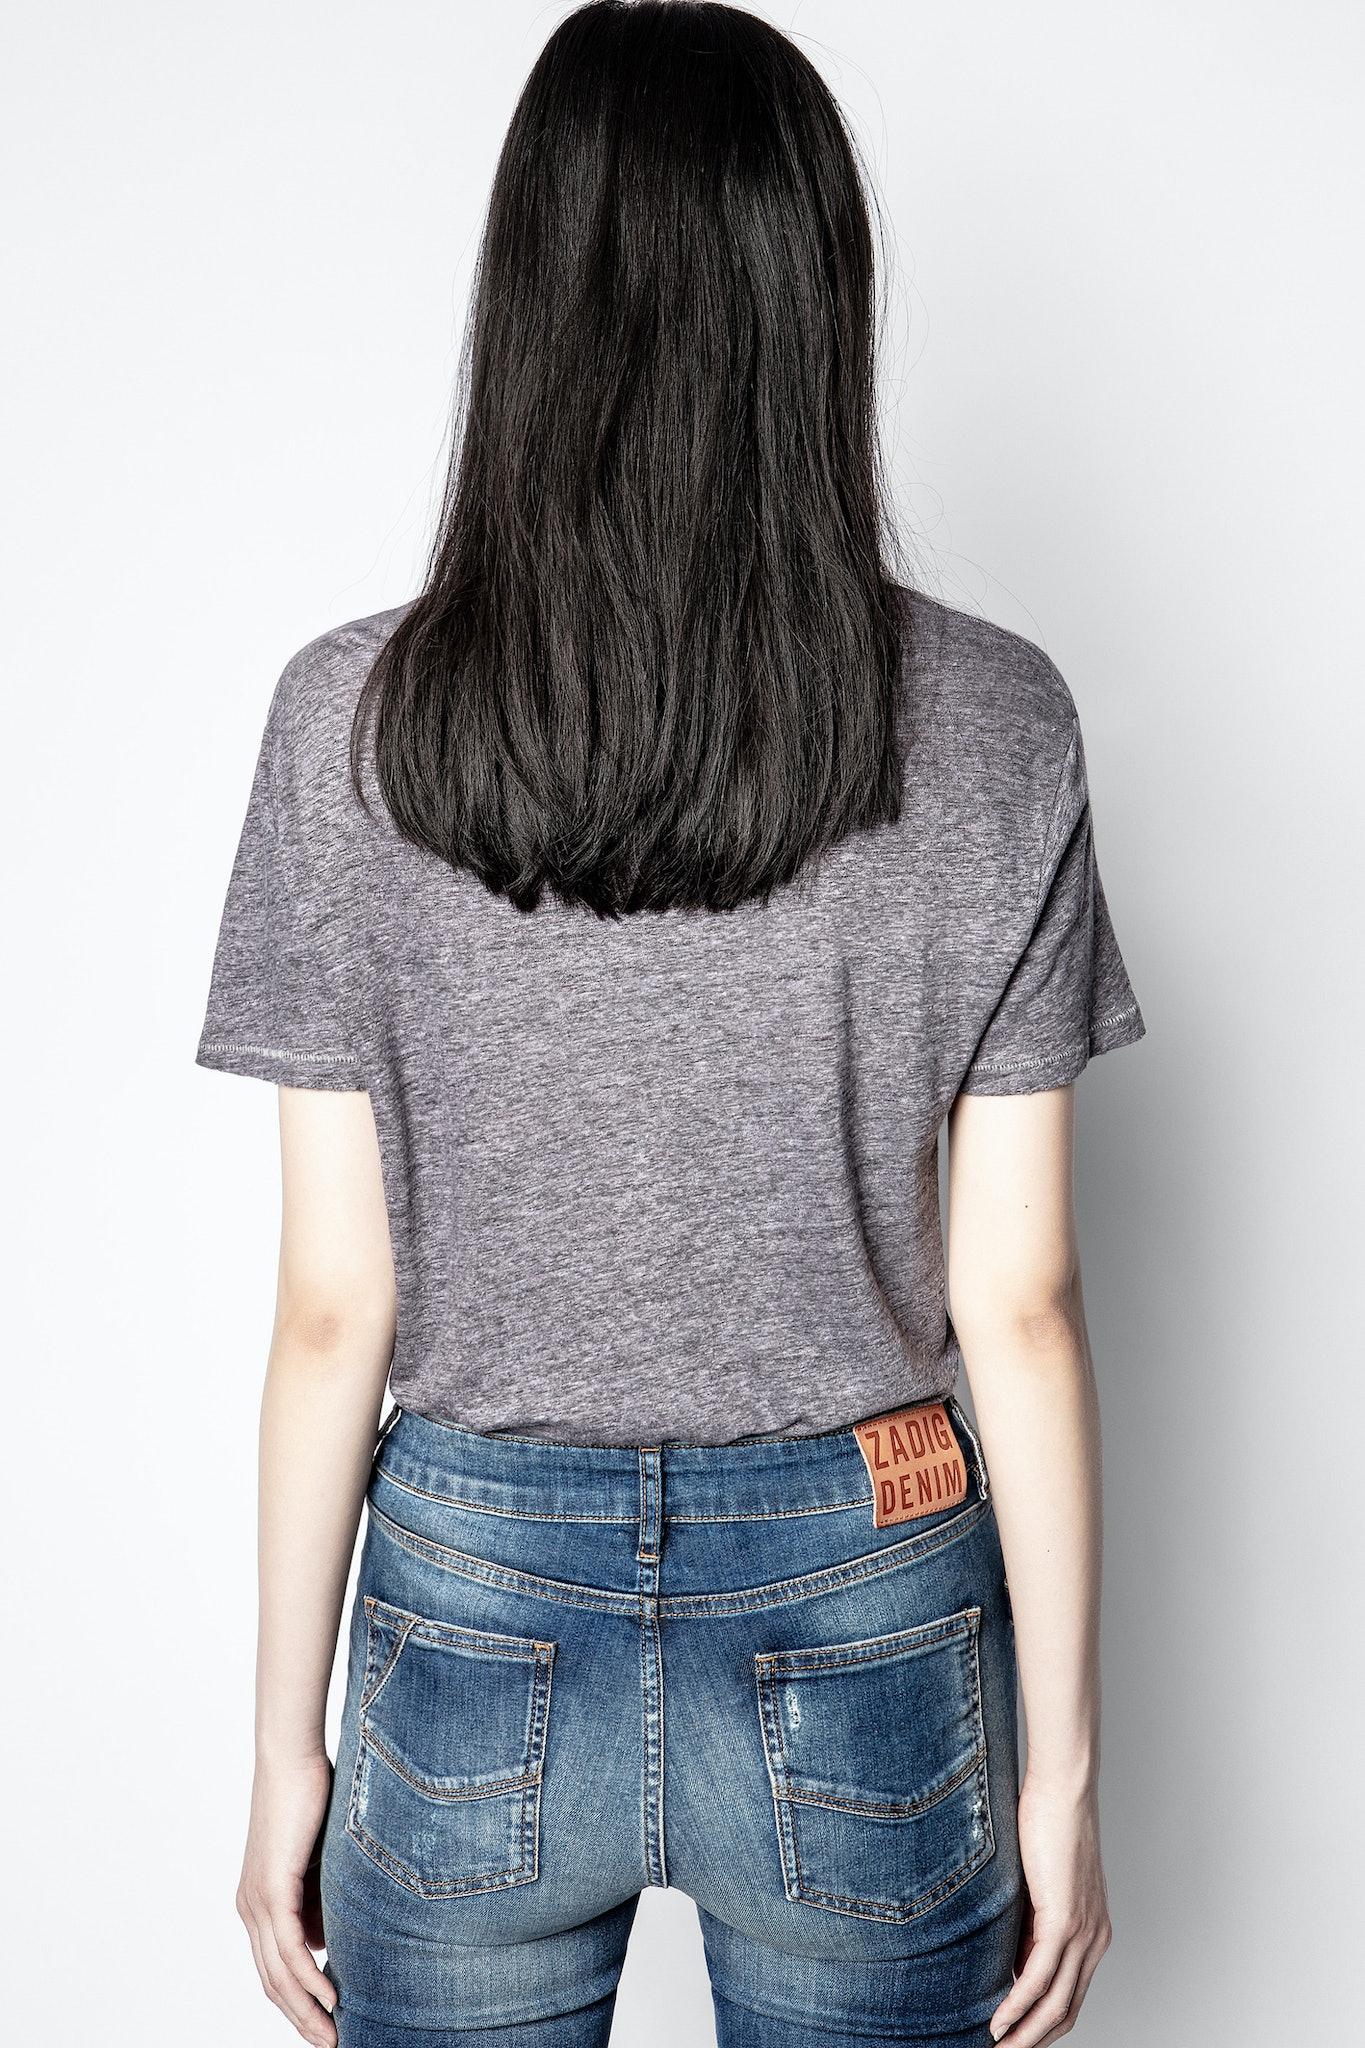 Amber Word T-Shirt